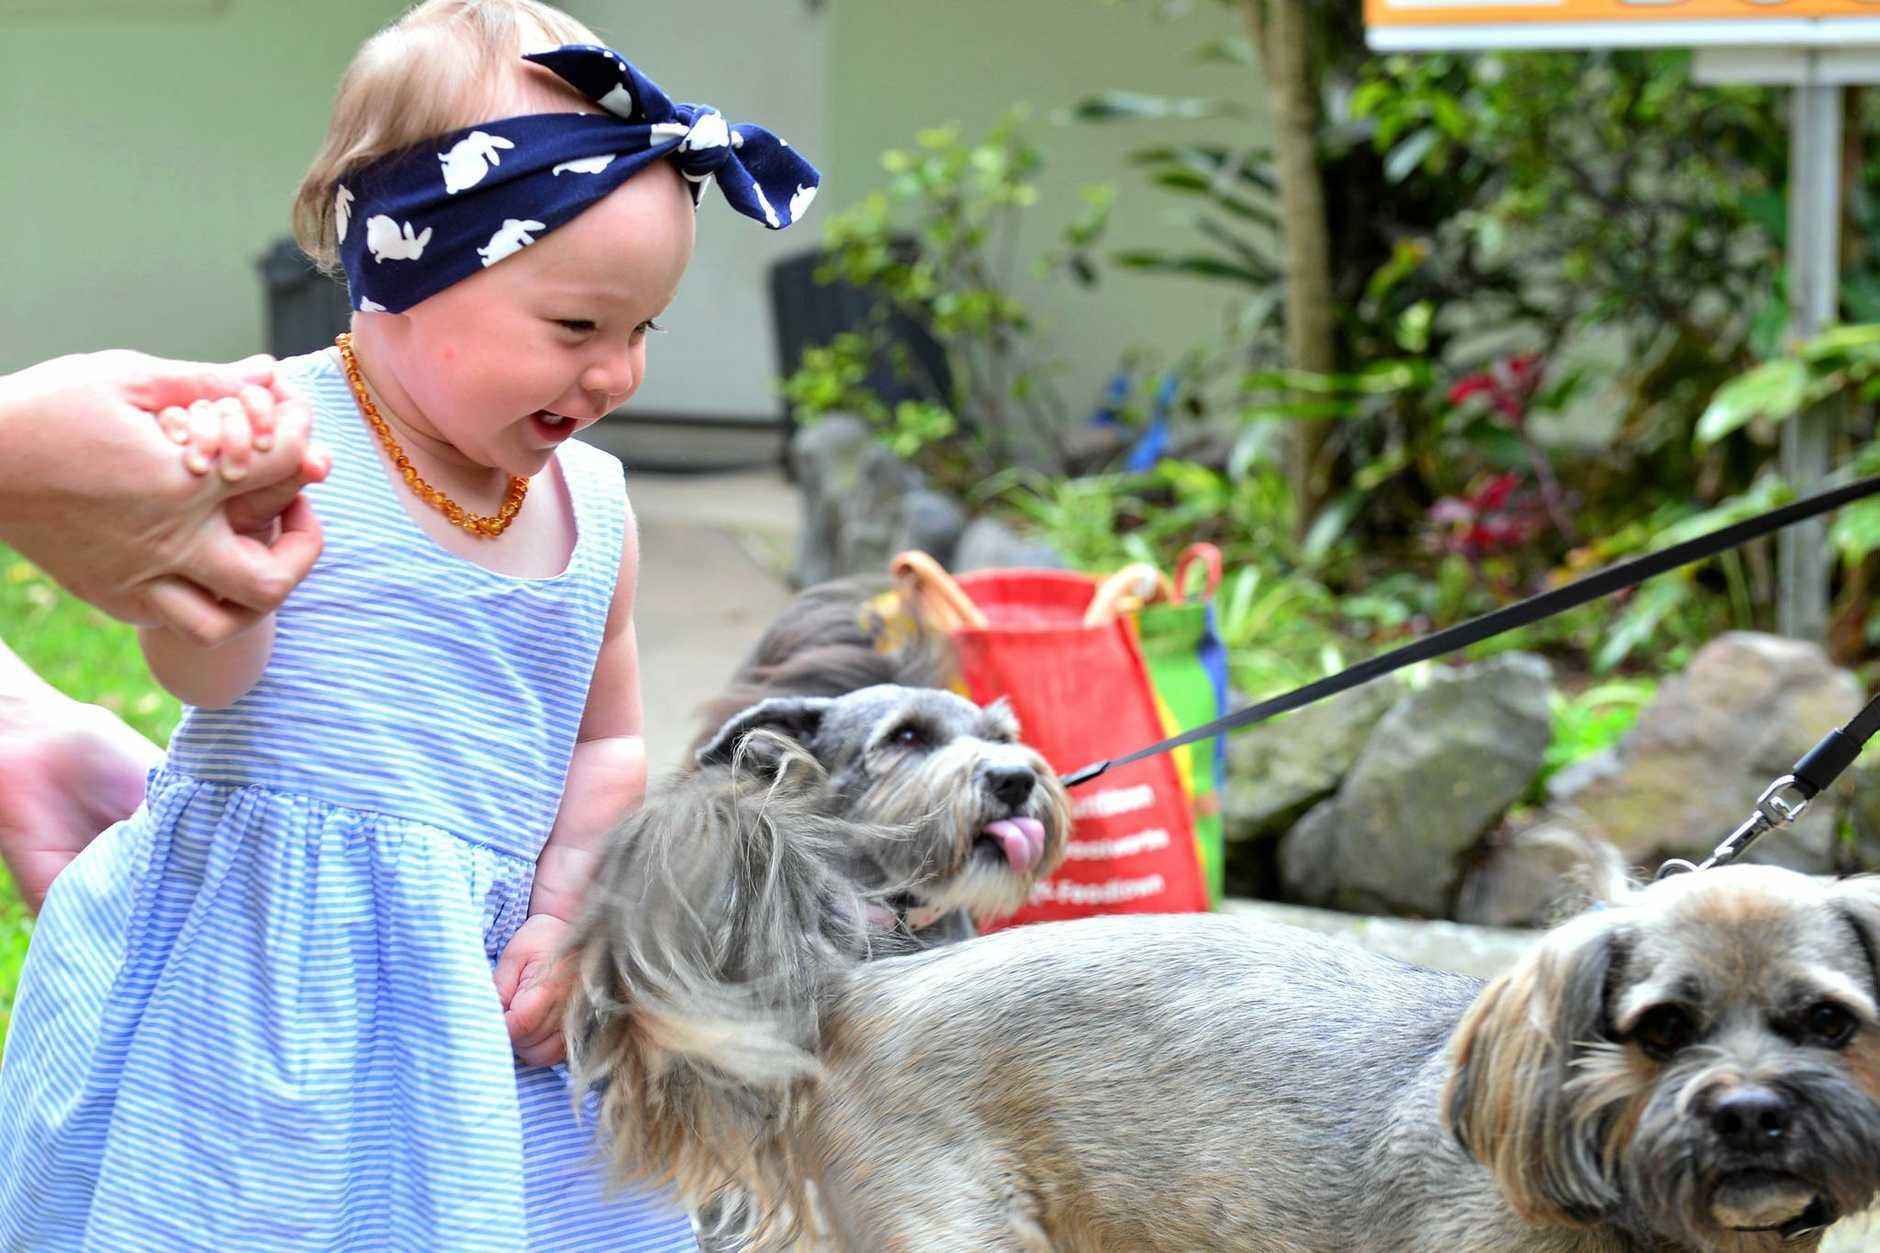 Birthday girl Esme Aspland celebrated her first birthday at Sunshine Coast Animal Refuge where she donated food, toys and blankets with her parents help.  Photo: John McCutcheon / Sunshine Coast Daily